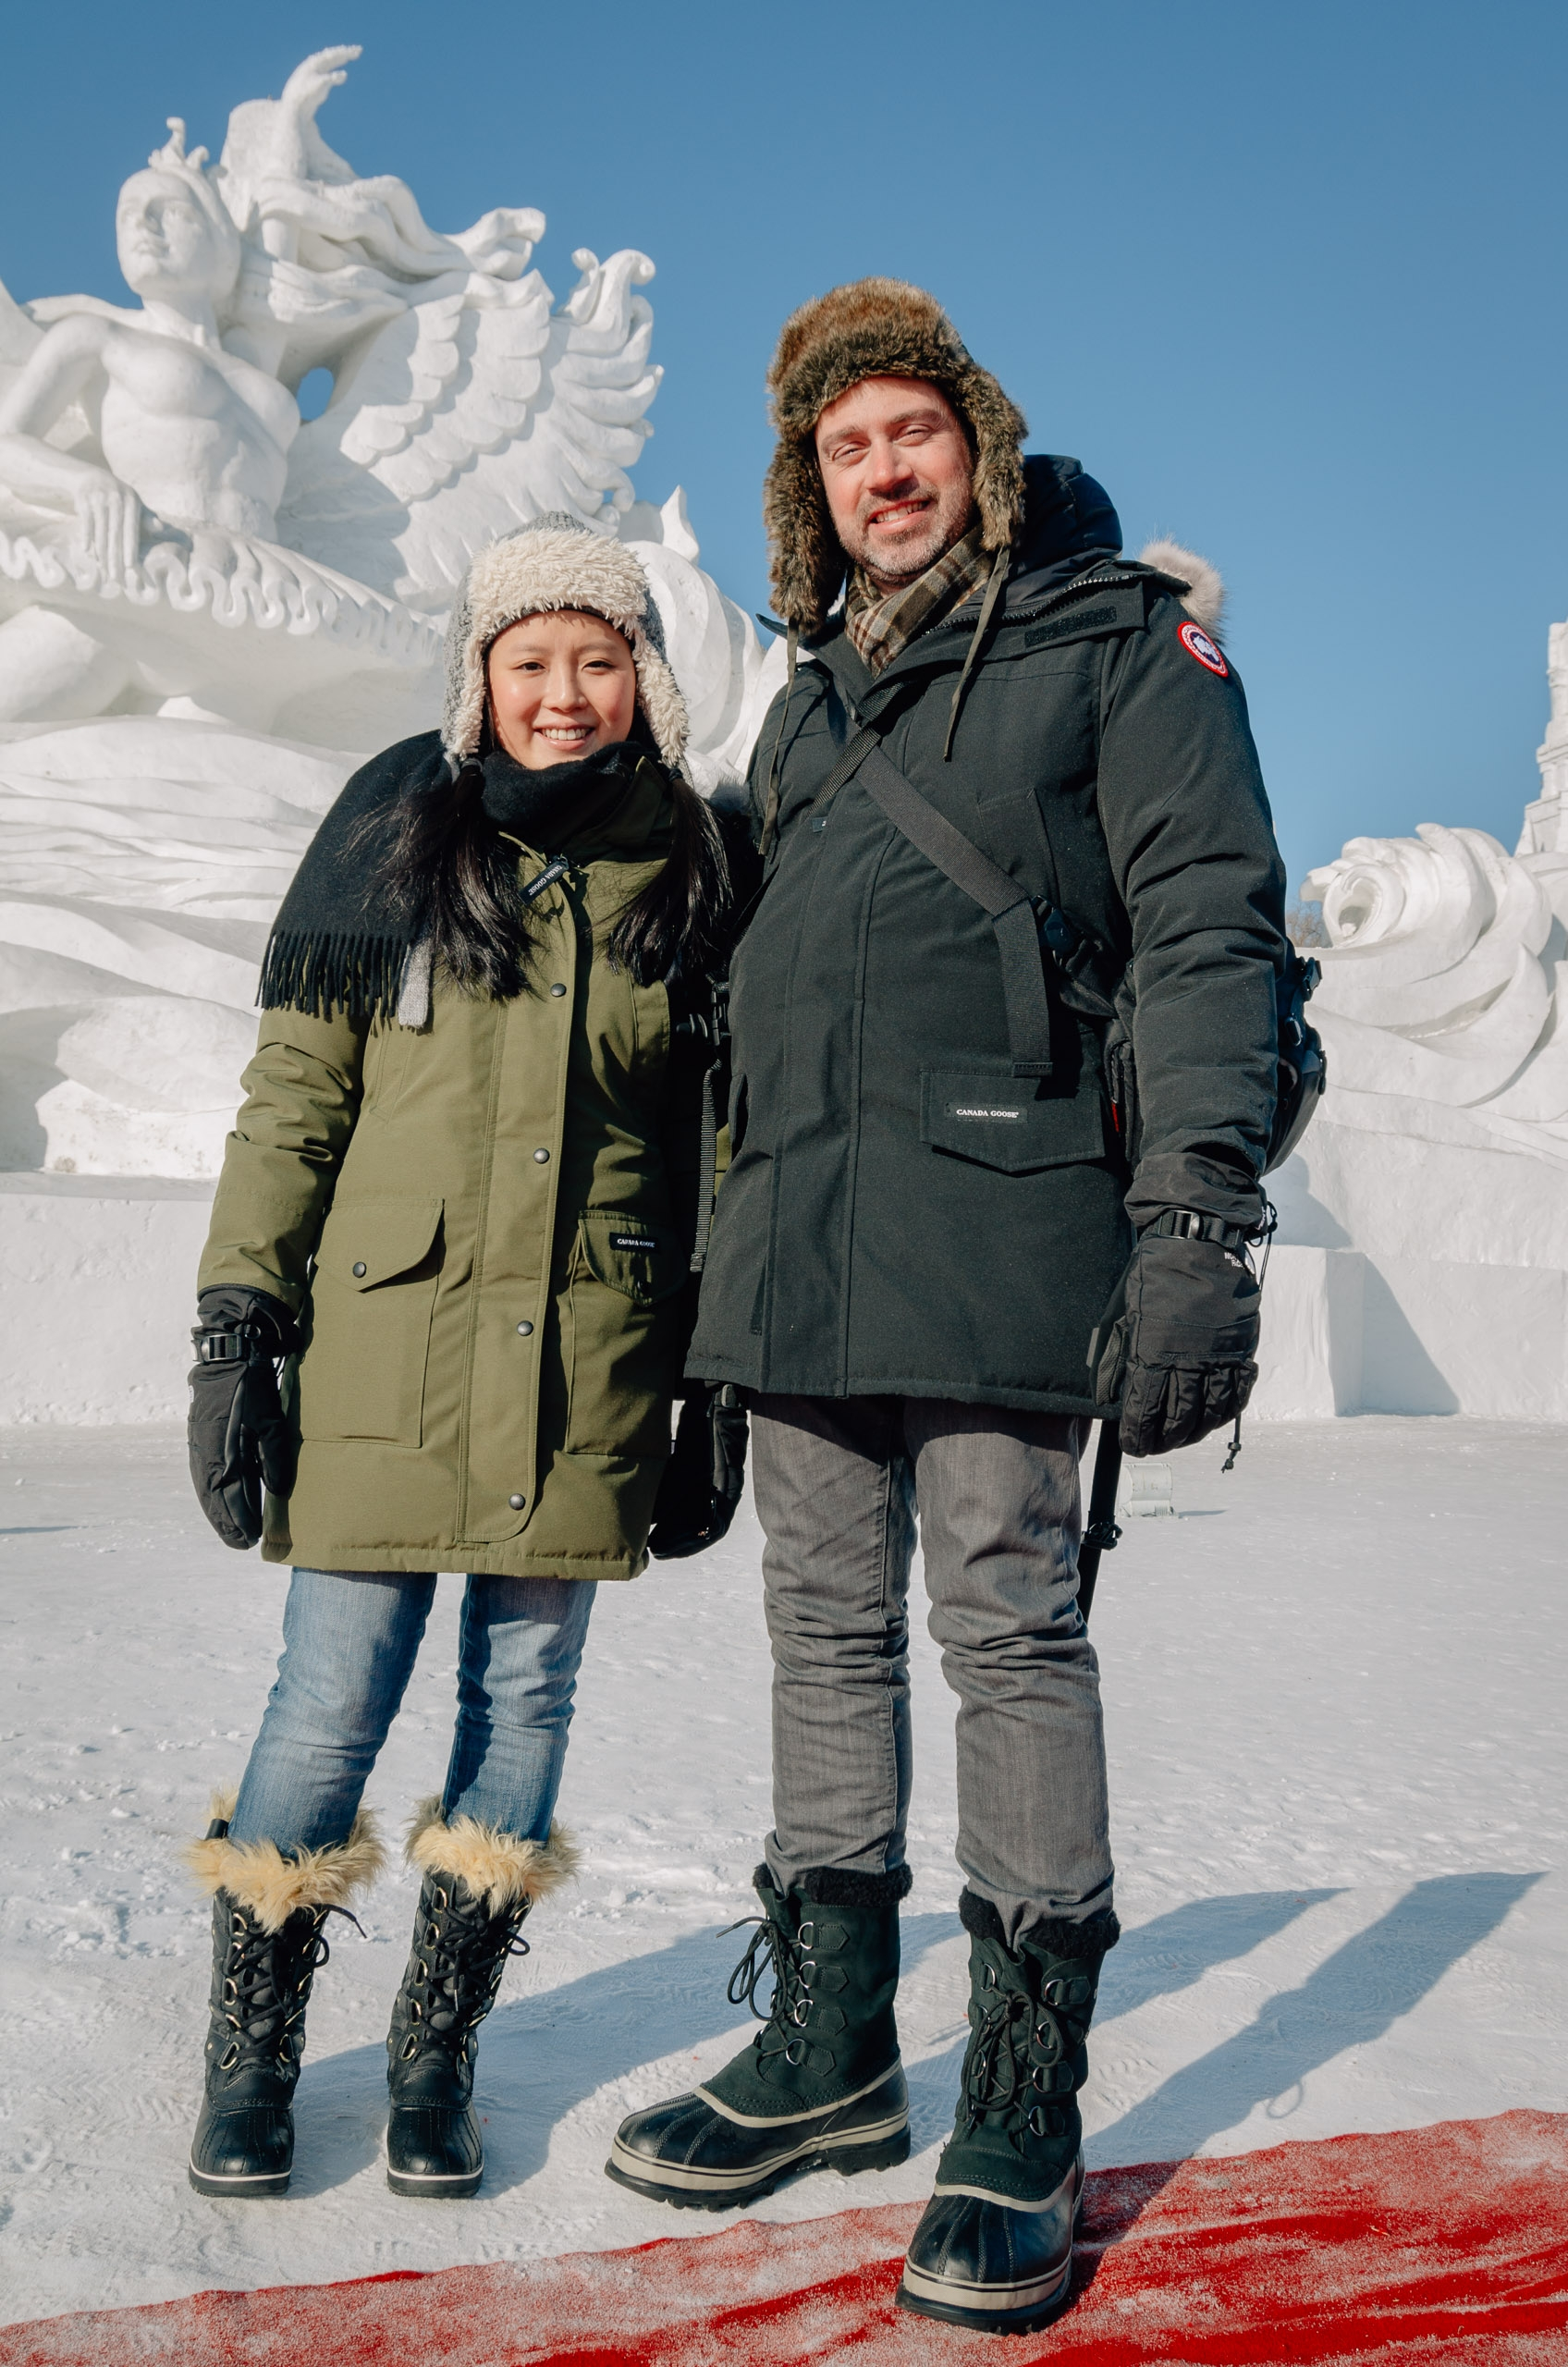 Harbin China Ice Festival - 2012-0108-DSC_2119